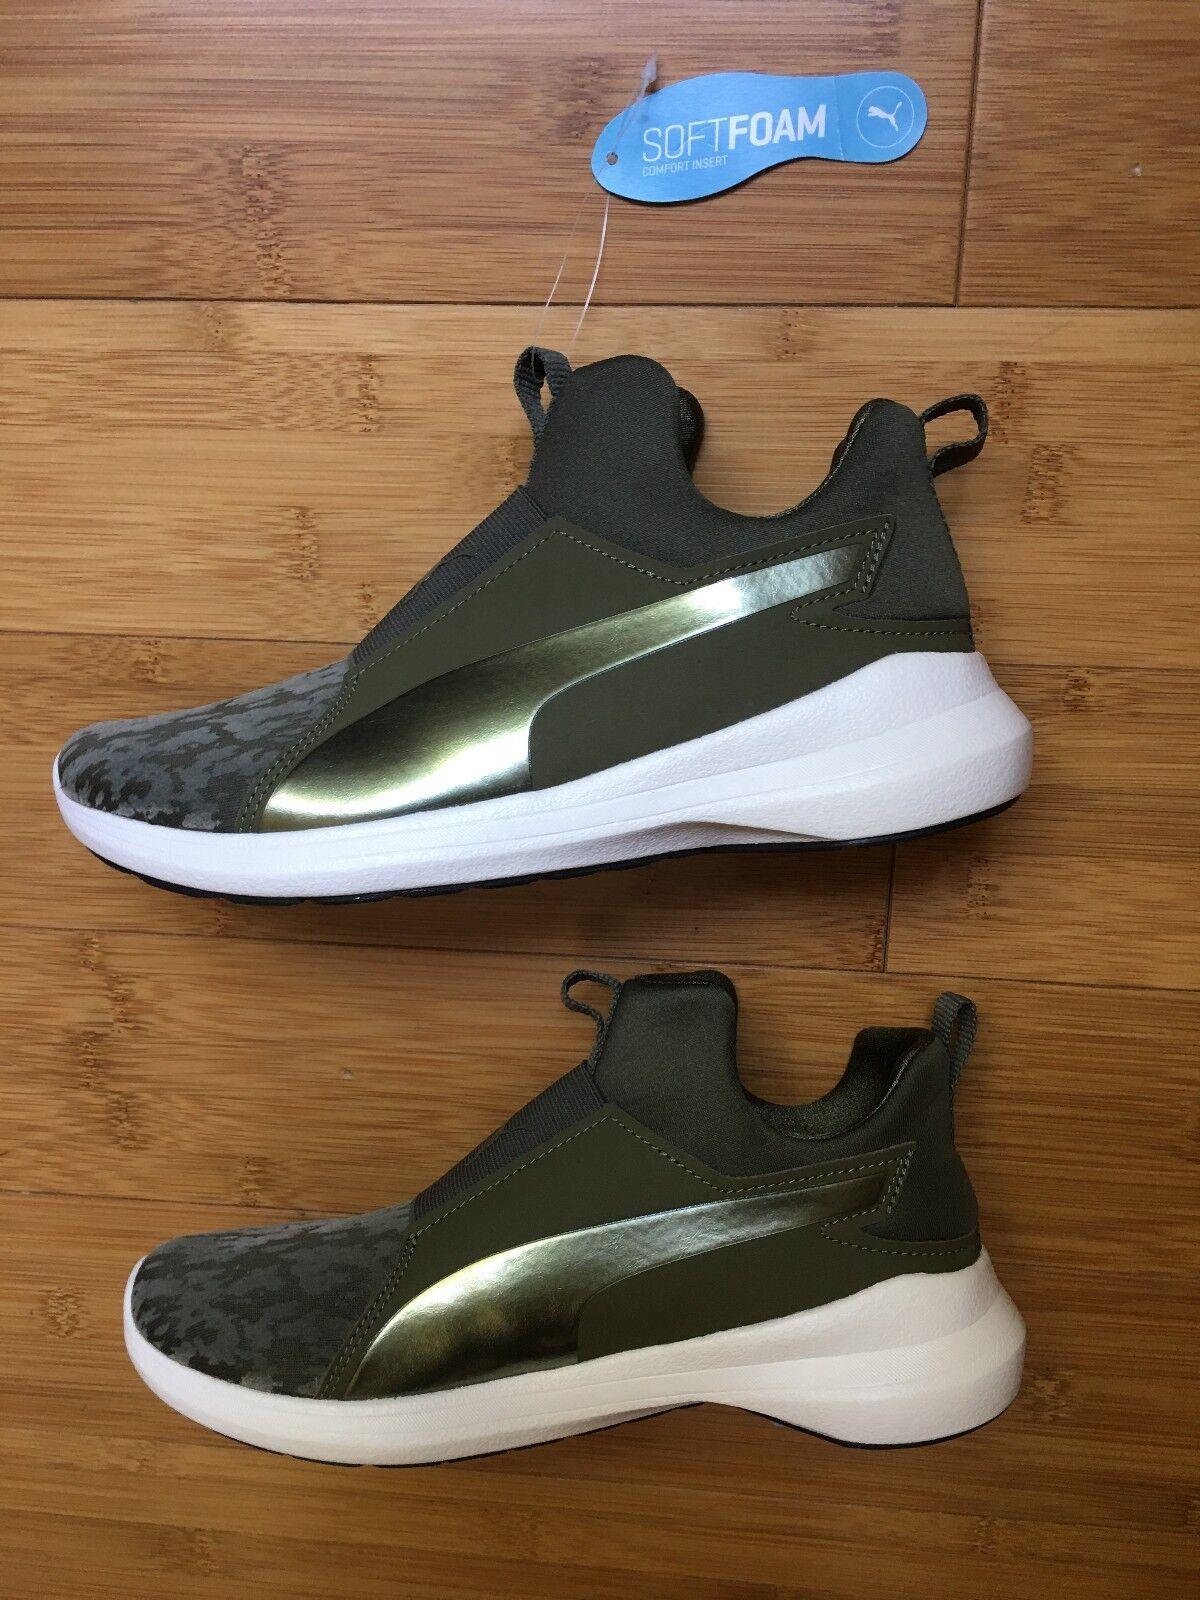 Authentic Damens PUMA Rebel Slip-On Sneaker GREEN   (U.S. Größe 6.5)  GREEN NEW 51770a